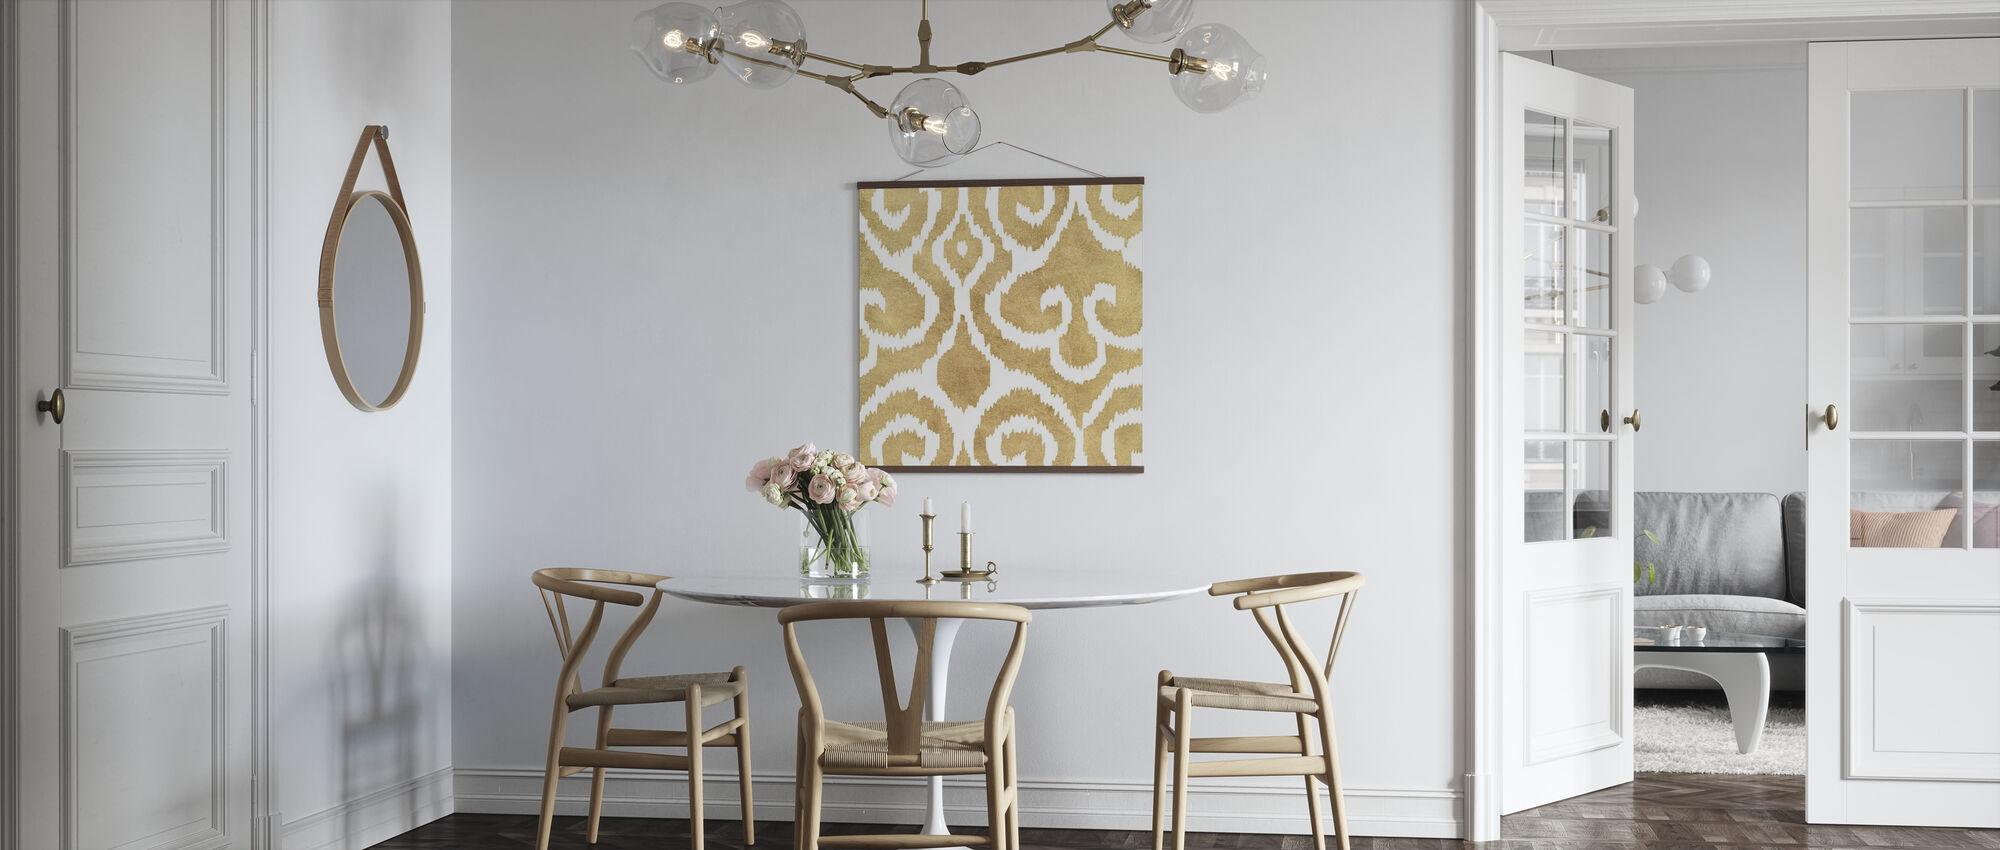 Simply Elegant - Poster - Kitchen